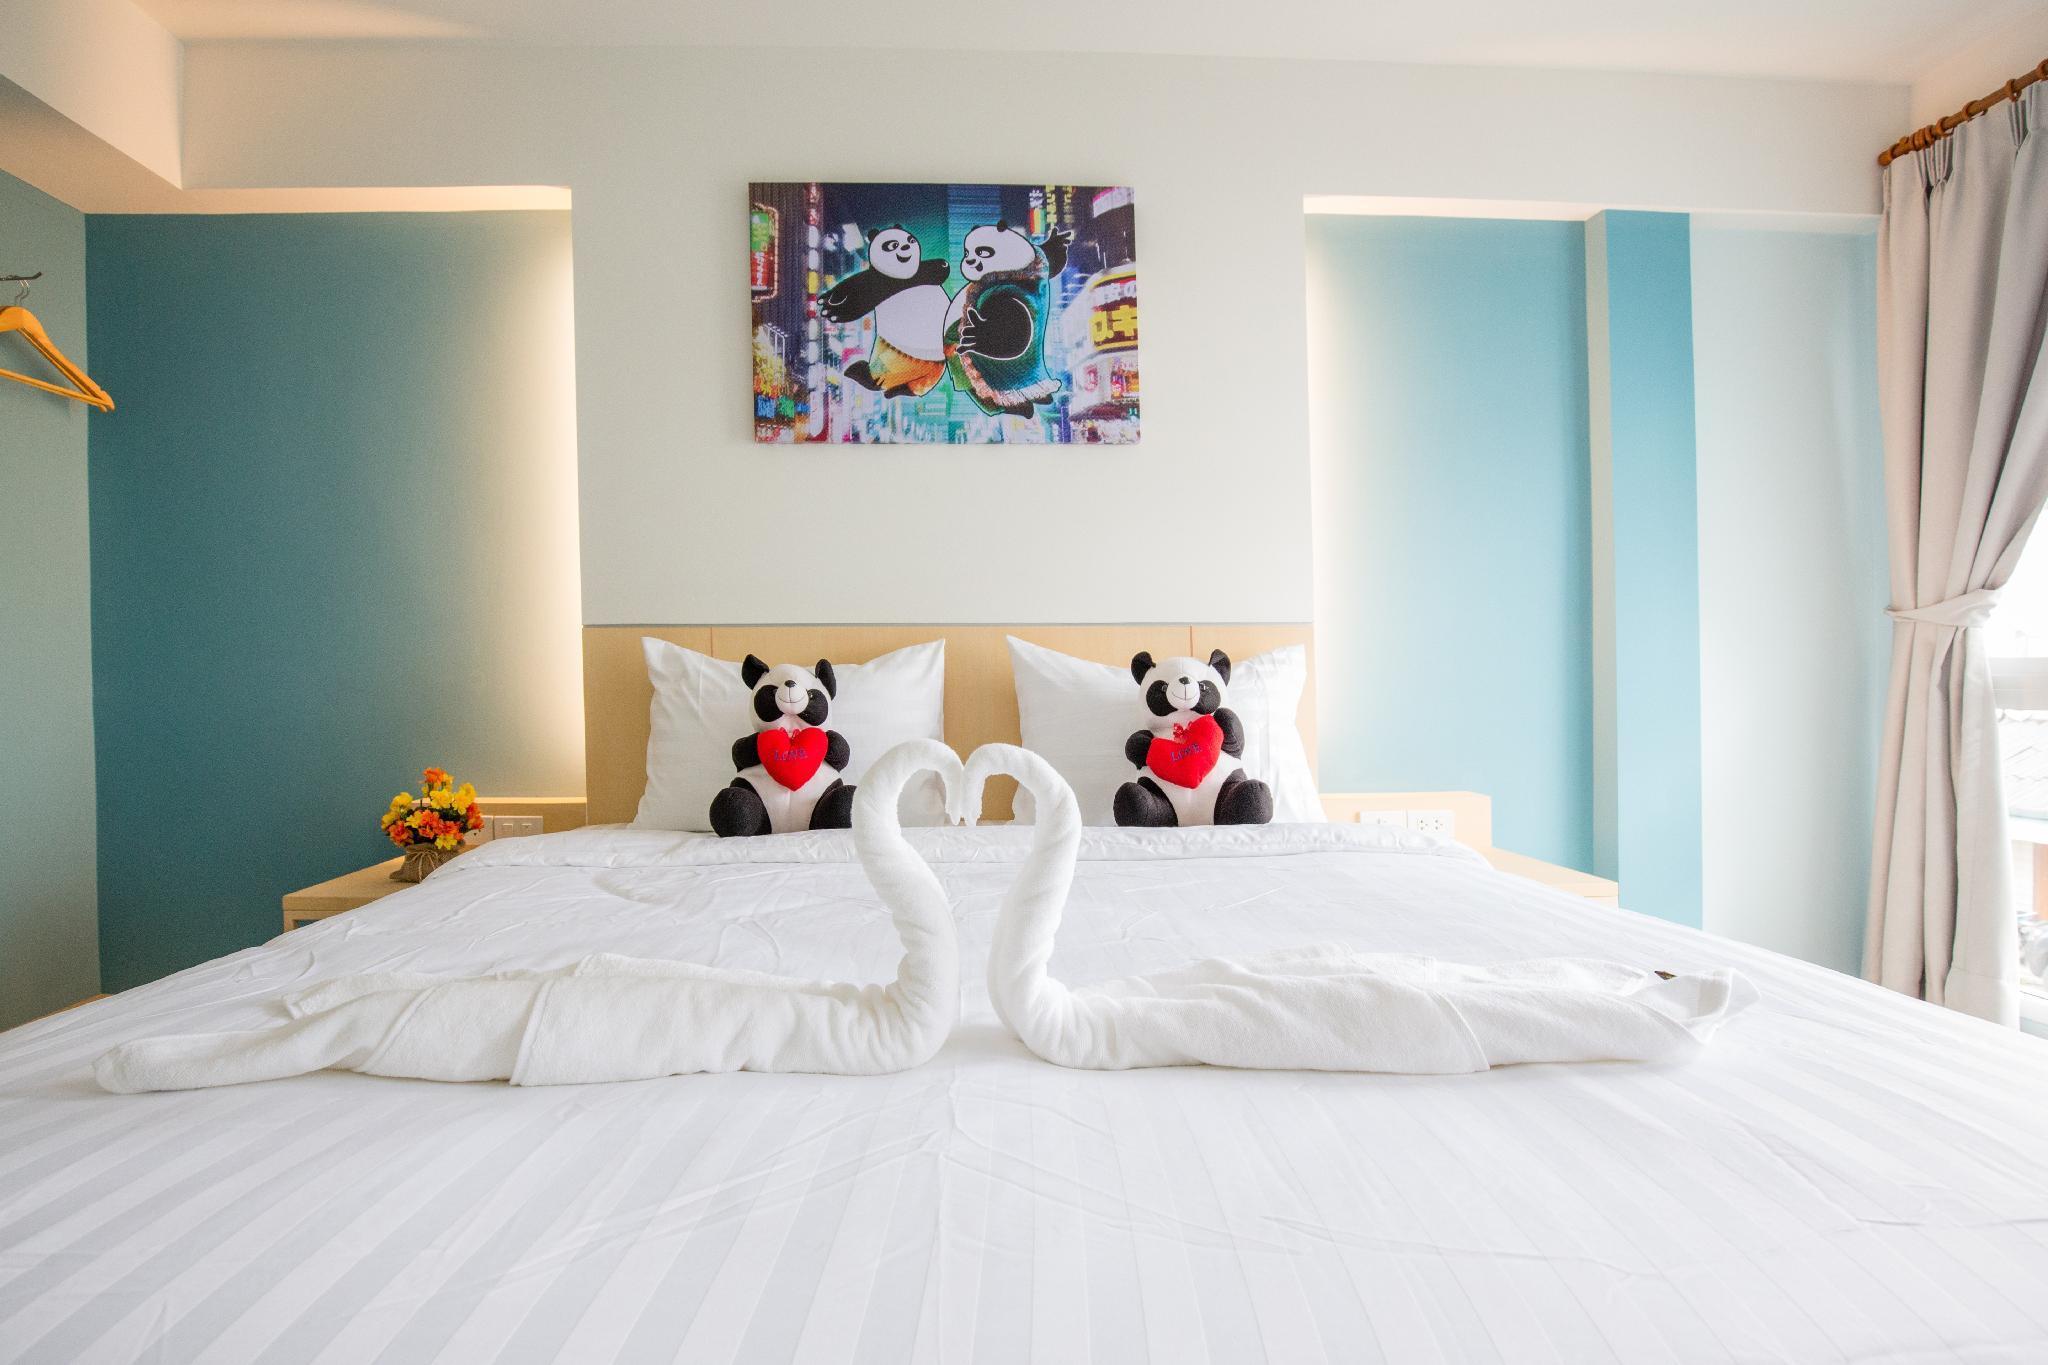 Lucky Panda Hotel